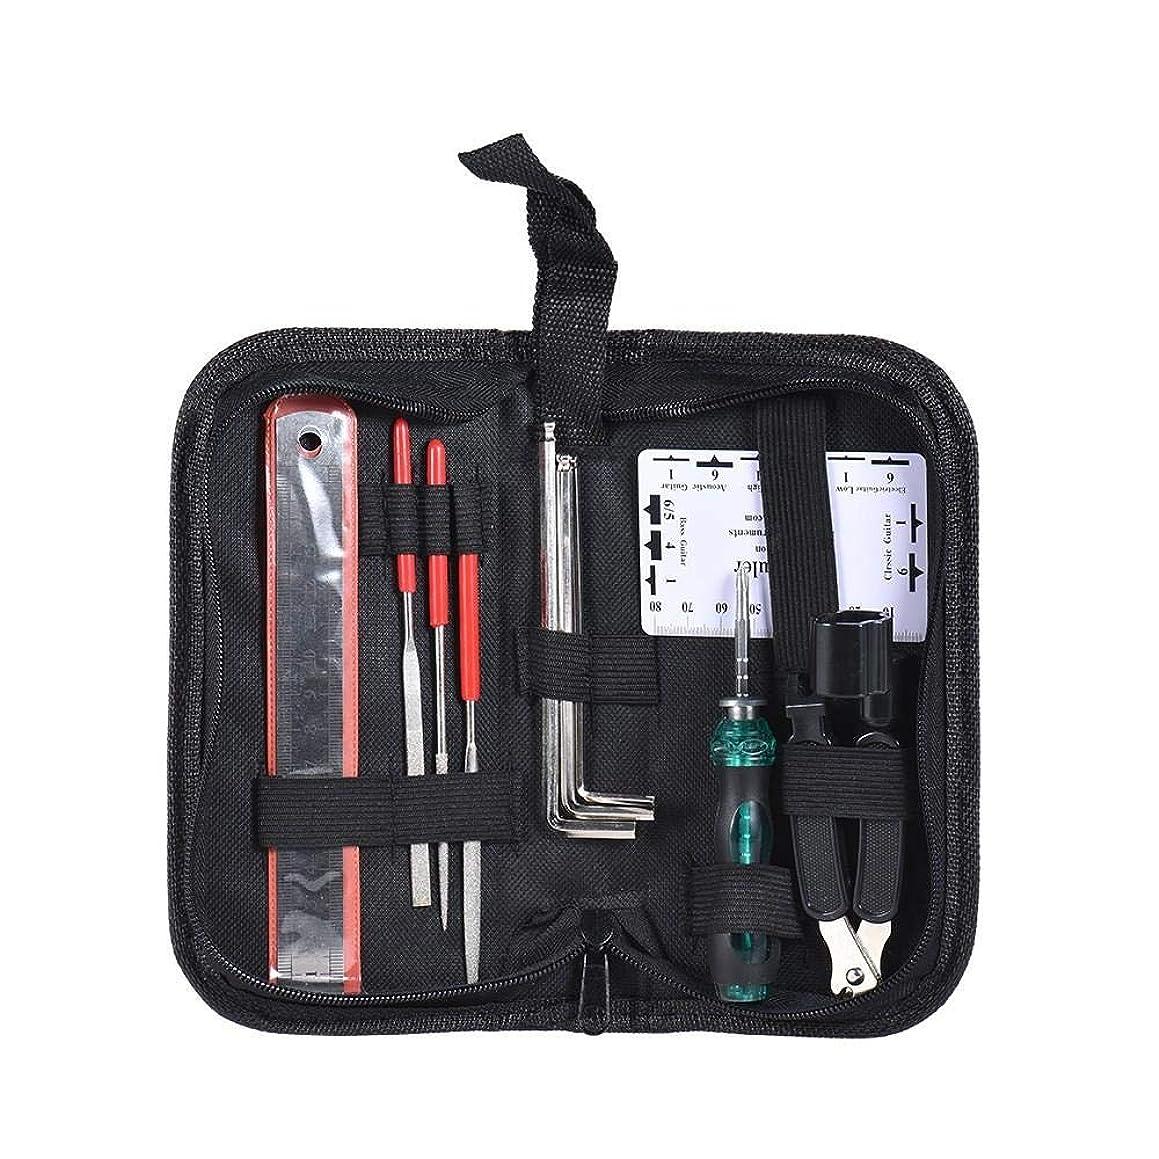 10Pcs Guitar Care Repair Wrench Ruler Maintenance Tech Kit with Bag - Musical Instruments Guitar Parts - 1 String Organizer, 1 String Action Ruler, 1 Gauge Measurer